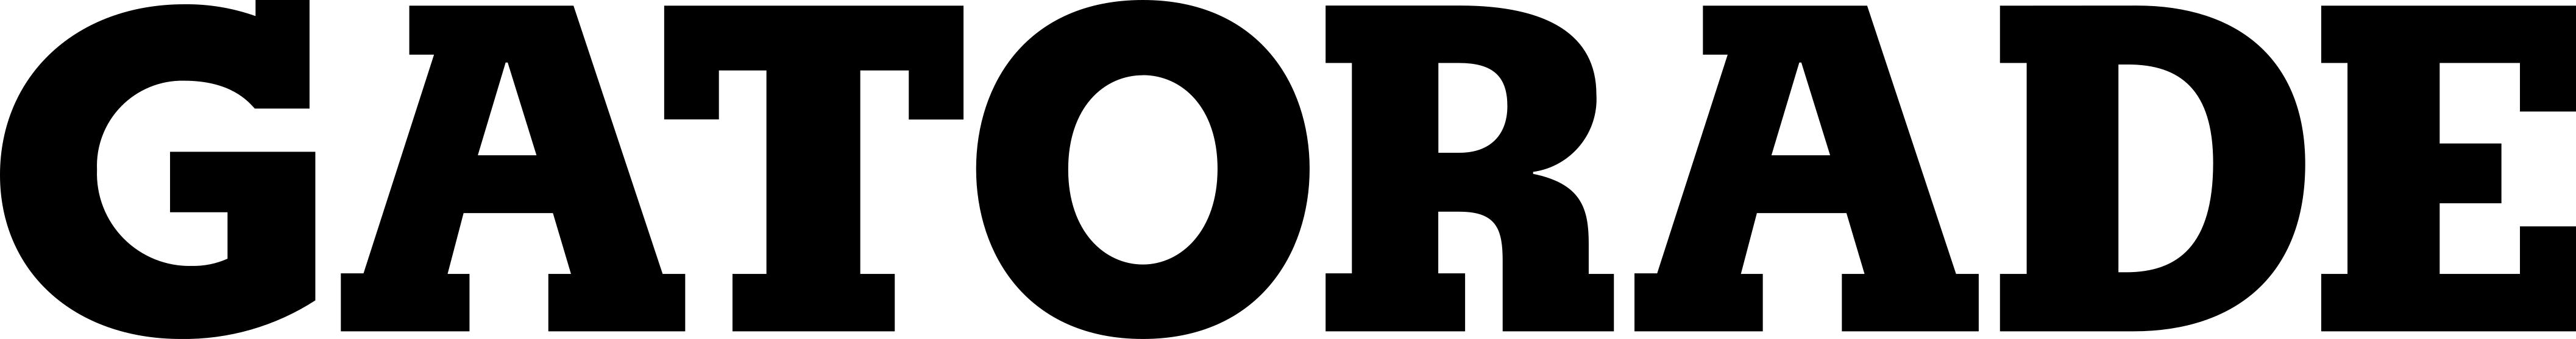 gatorade logo 1 1 - Gatorade Logo